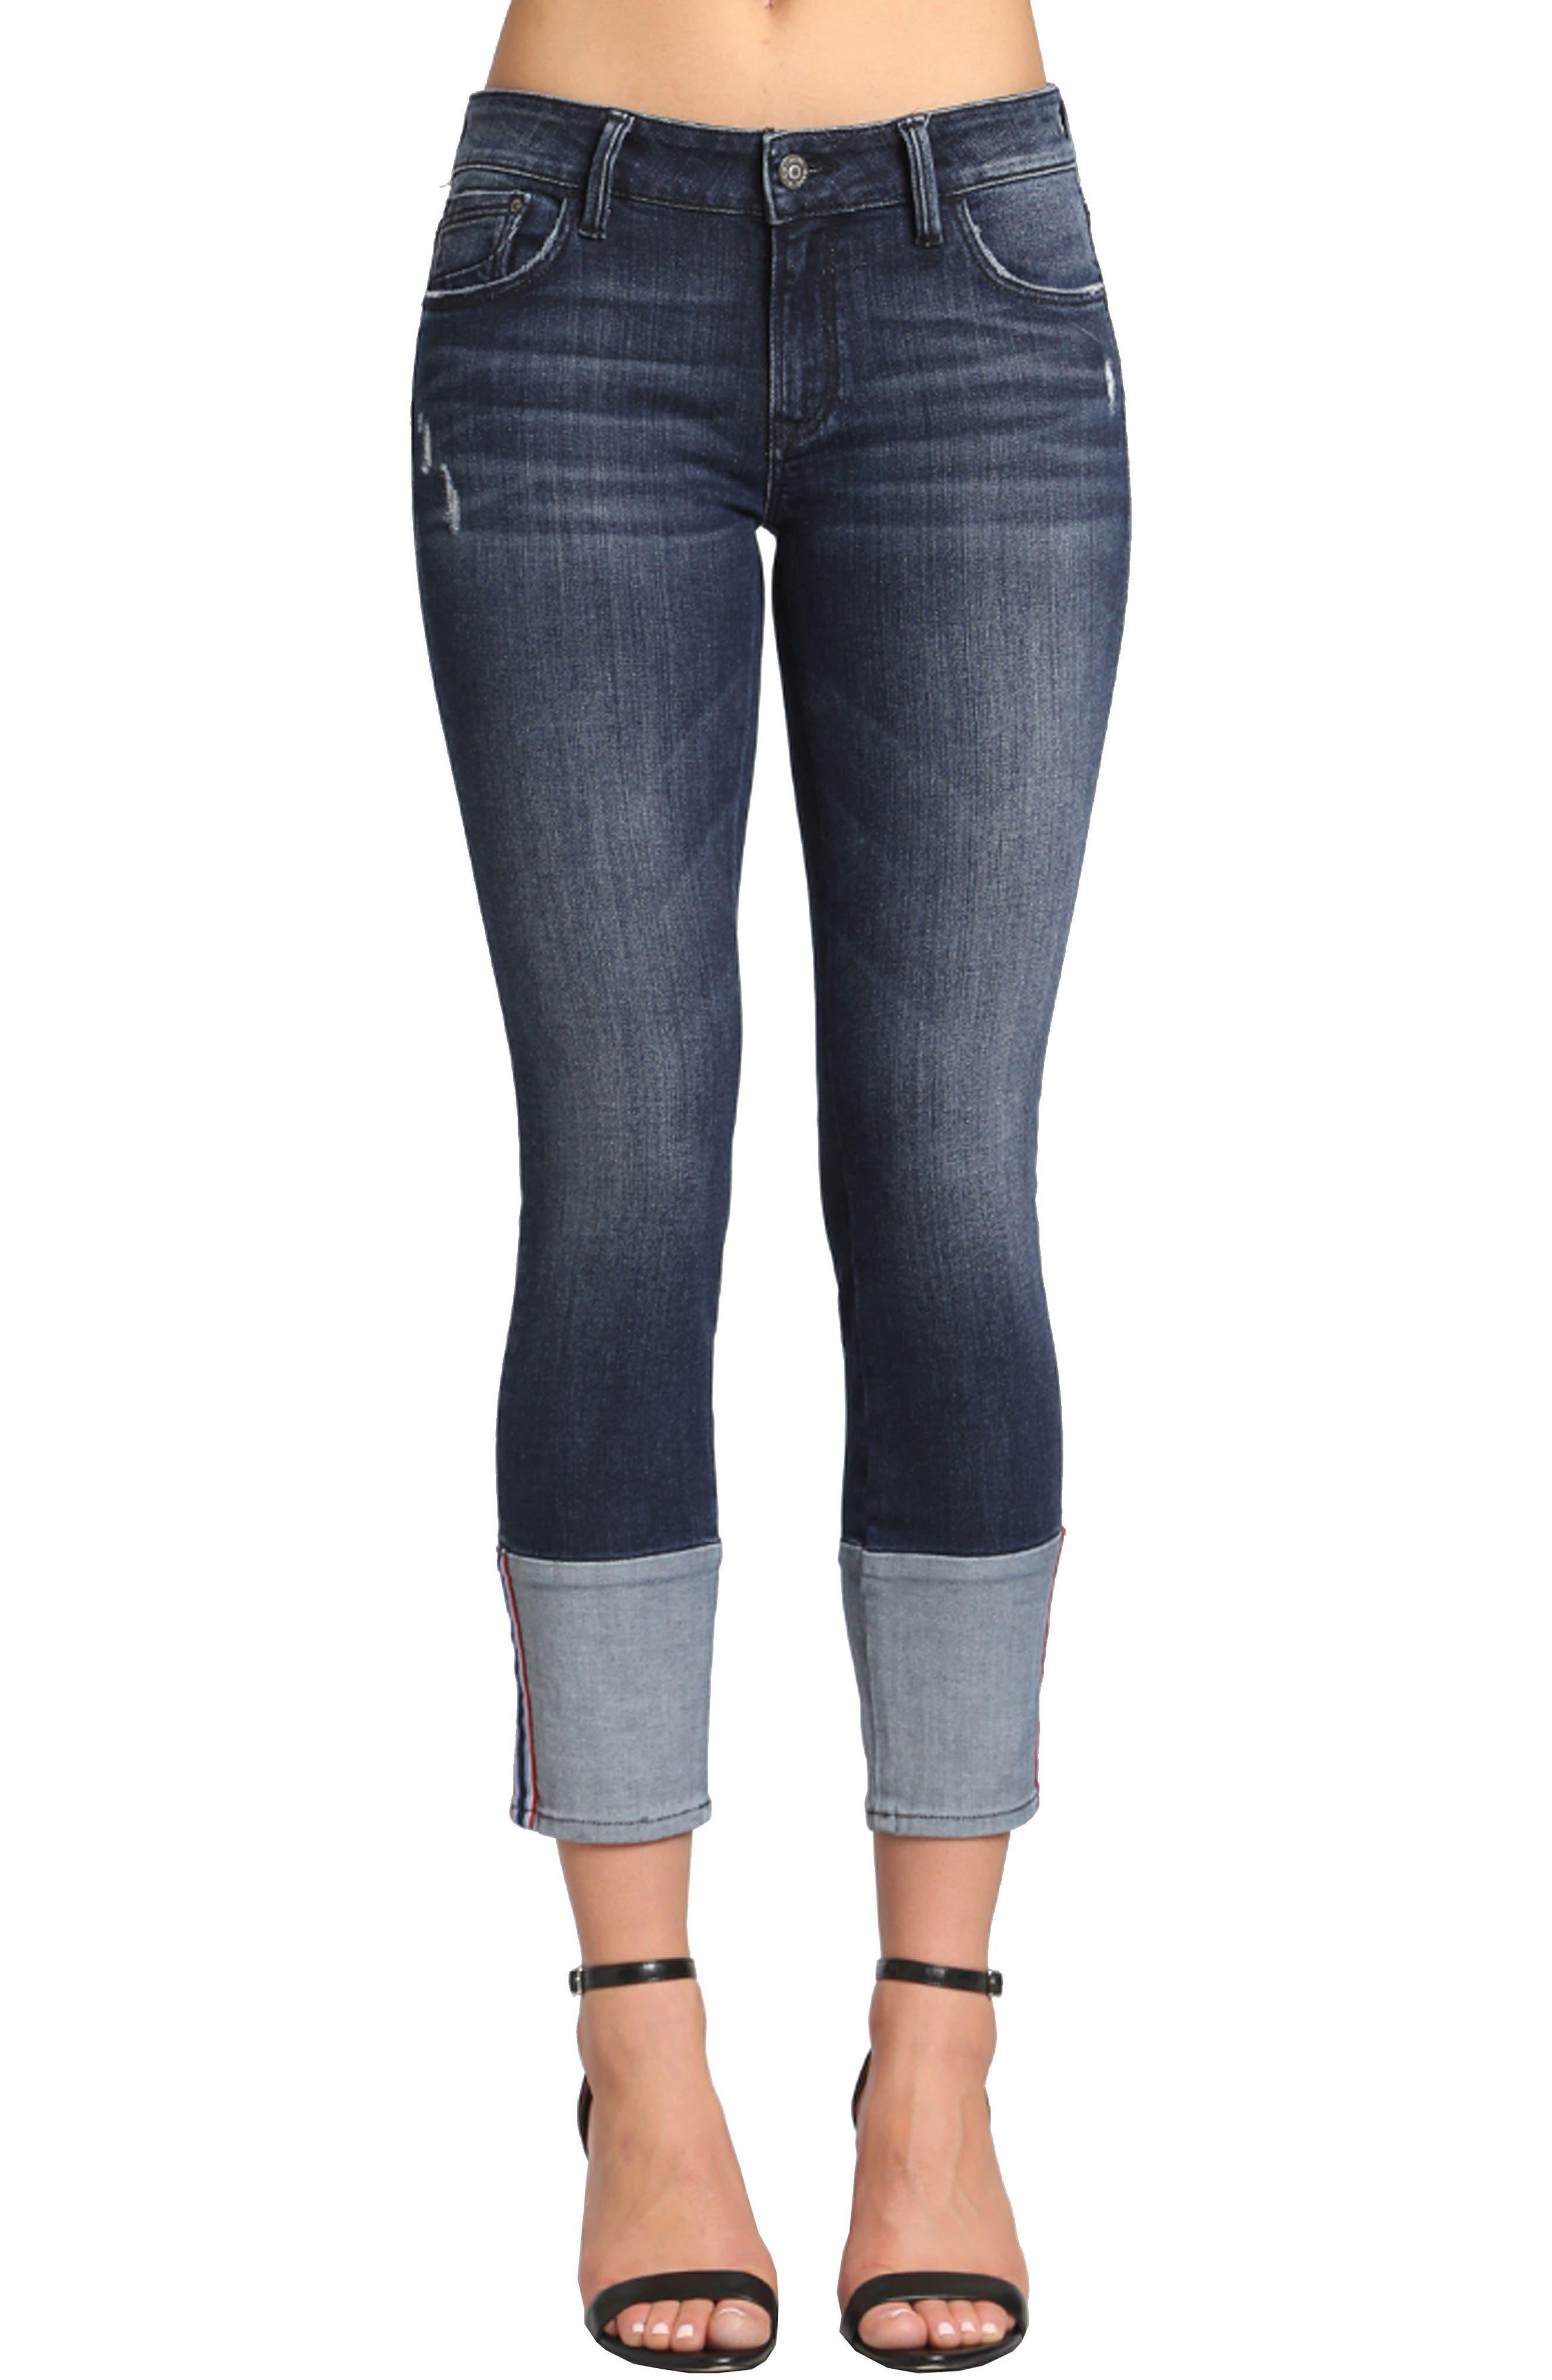 Main Image - Mavi Jeans Caisy Cuffed Skinny Crop Jeans (Dark Vintage)